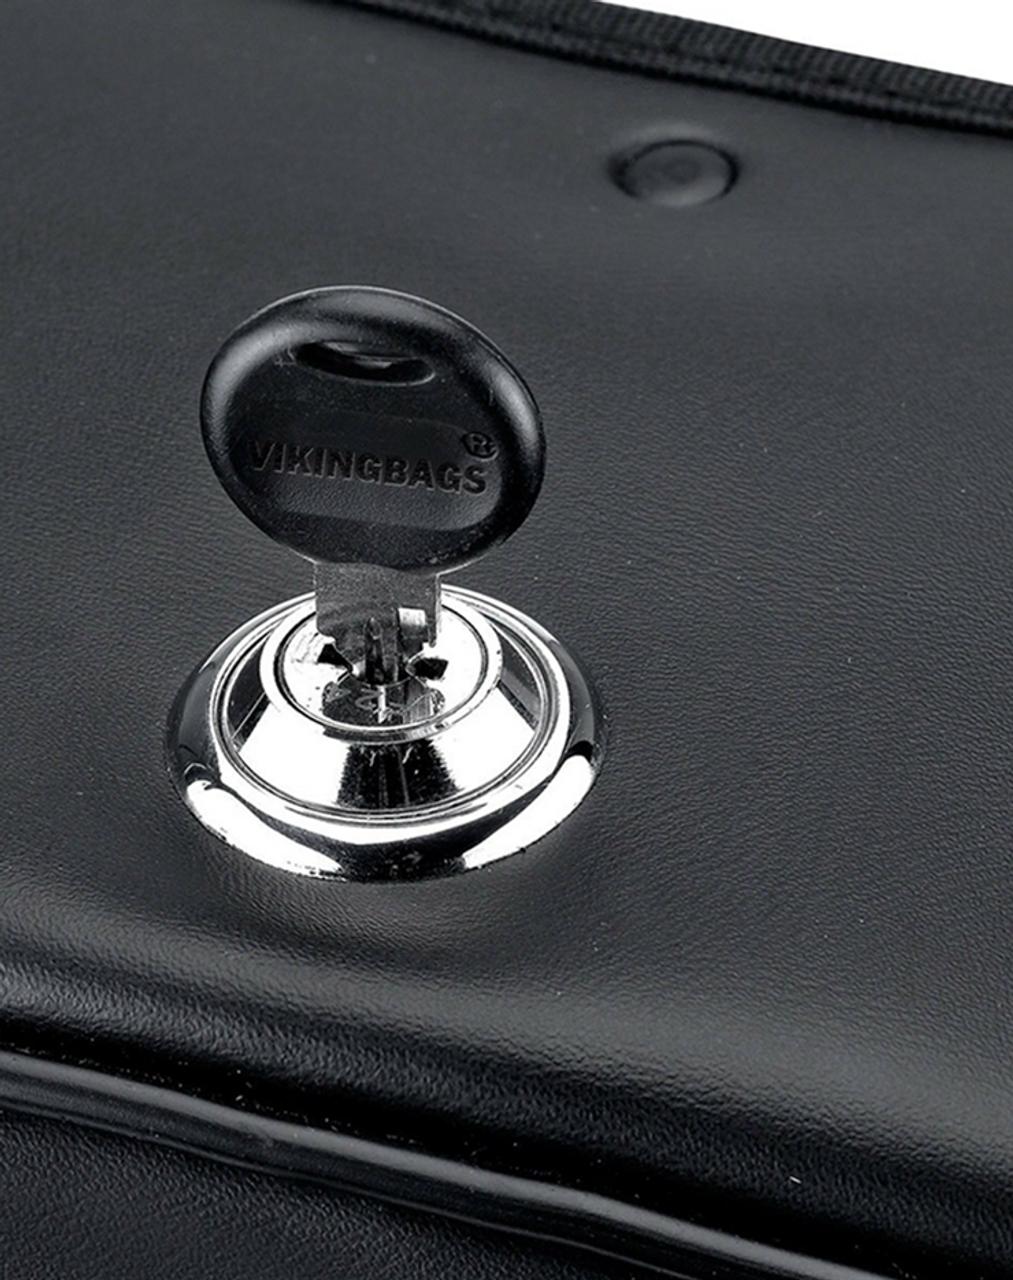 Triumph Rocket III Roadster Side Pocket Studded Motorcycle Saddlebags Key Lock View